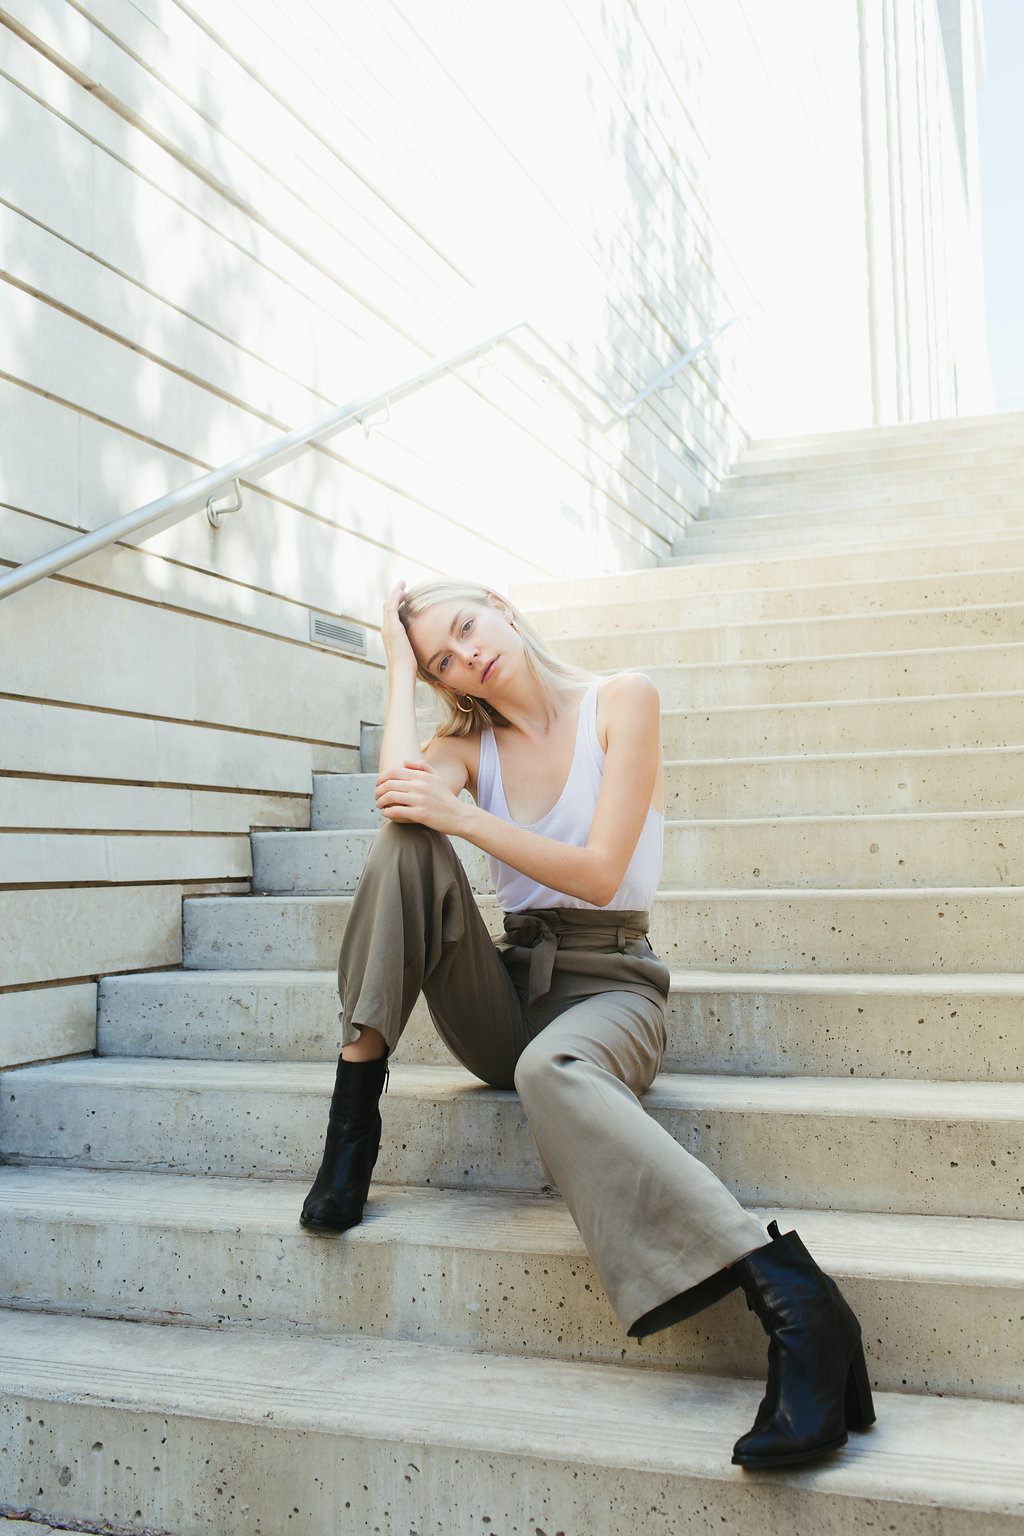 Paige-Newton-Austin-Model-Fashion-Photography0003.jpg